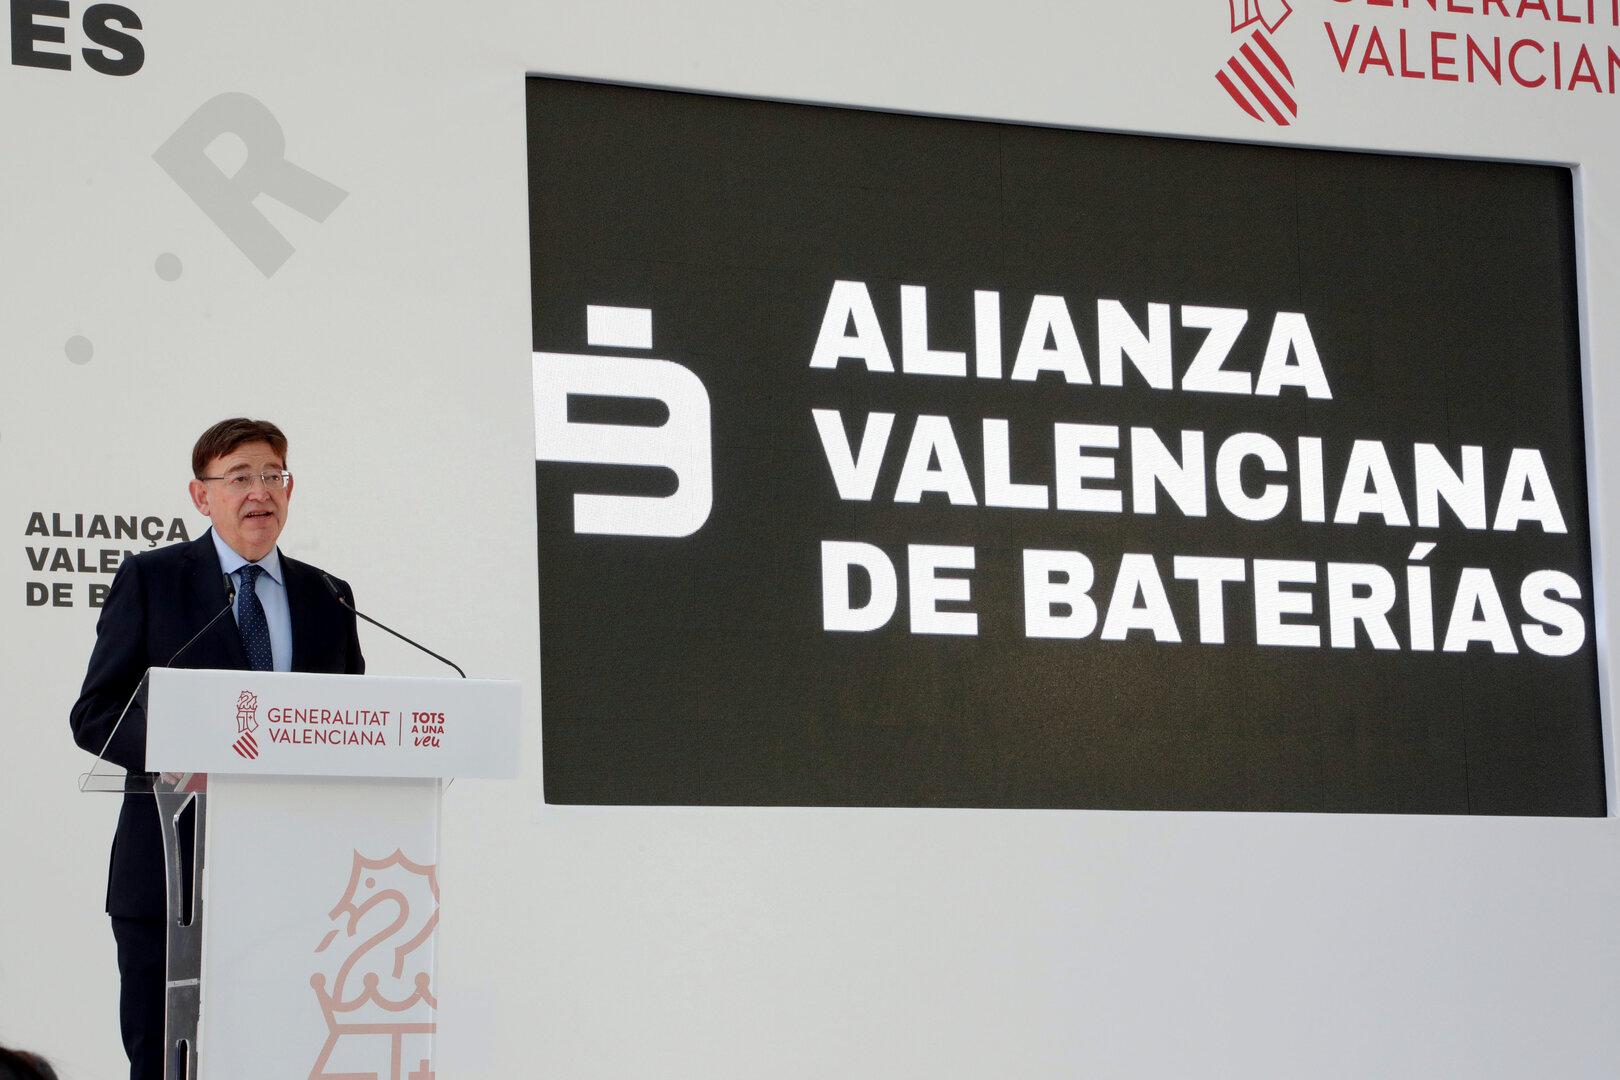 Valencia acogerá una gigafábrica de baterías destinadas a vehículos eléctricos